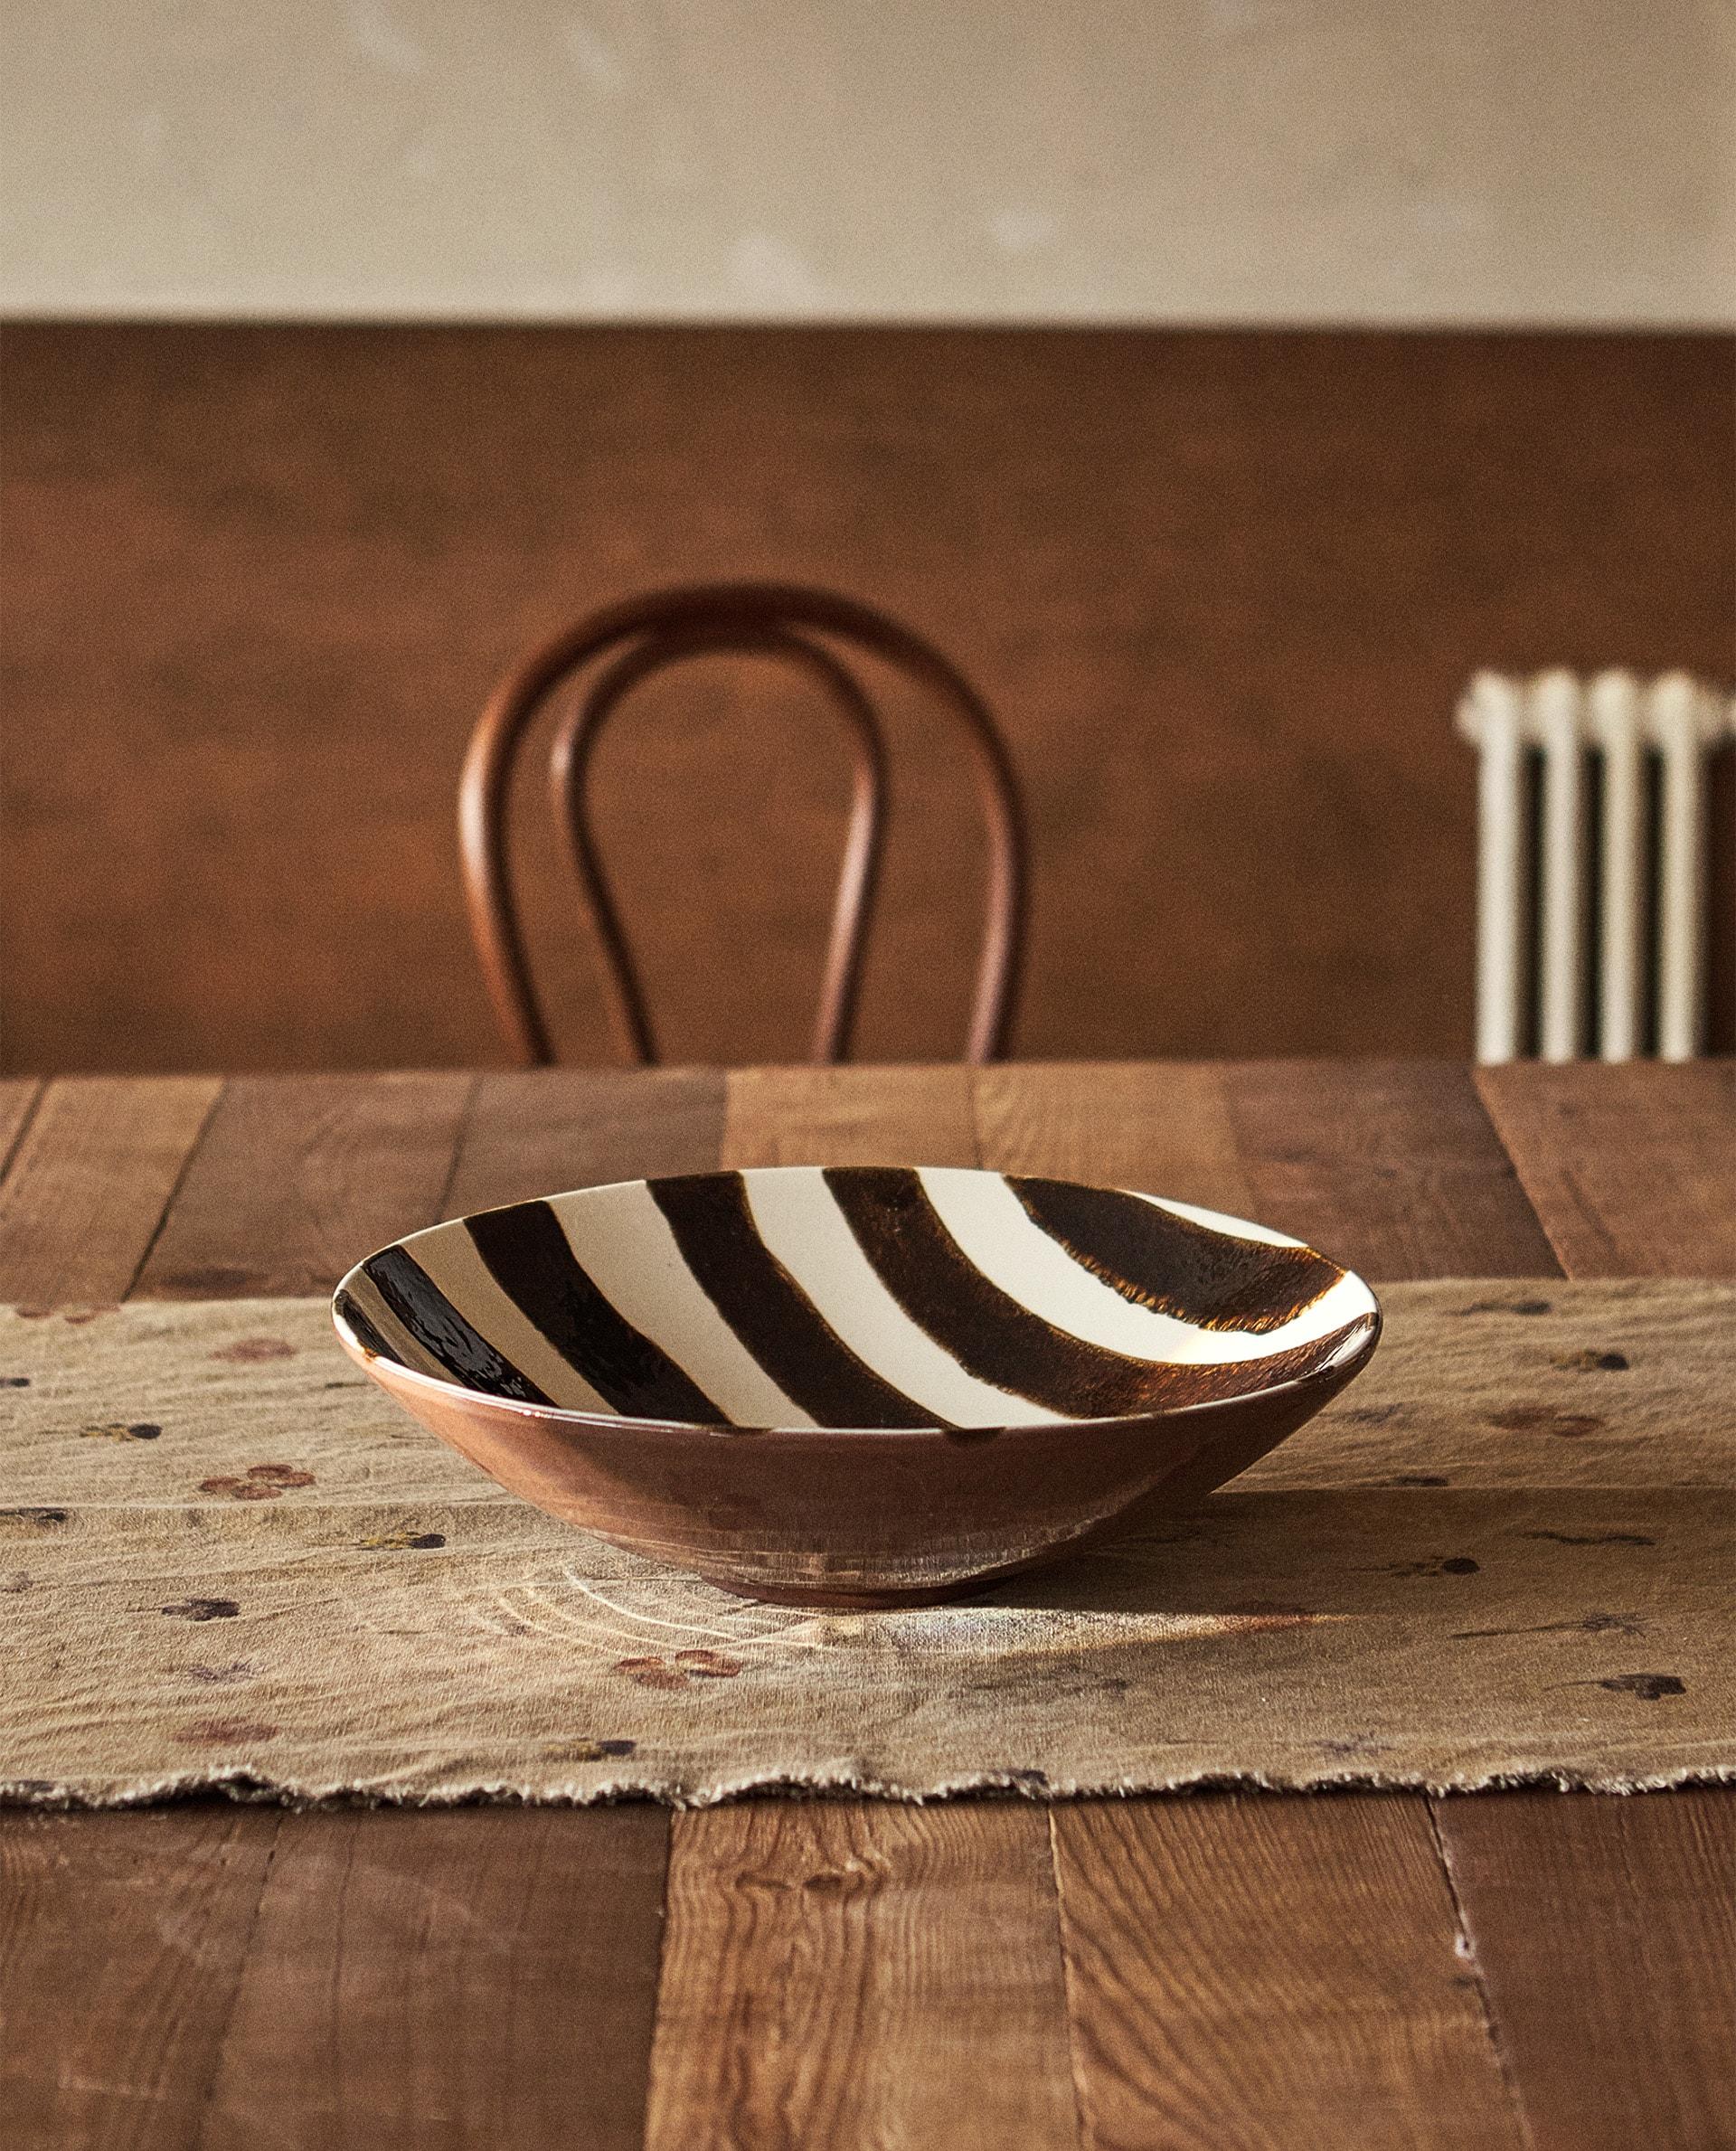 Zebra Print Tray Decor Accessories Living Room Zara Home United States Of America